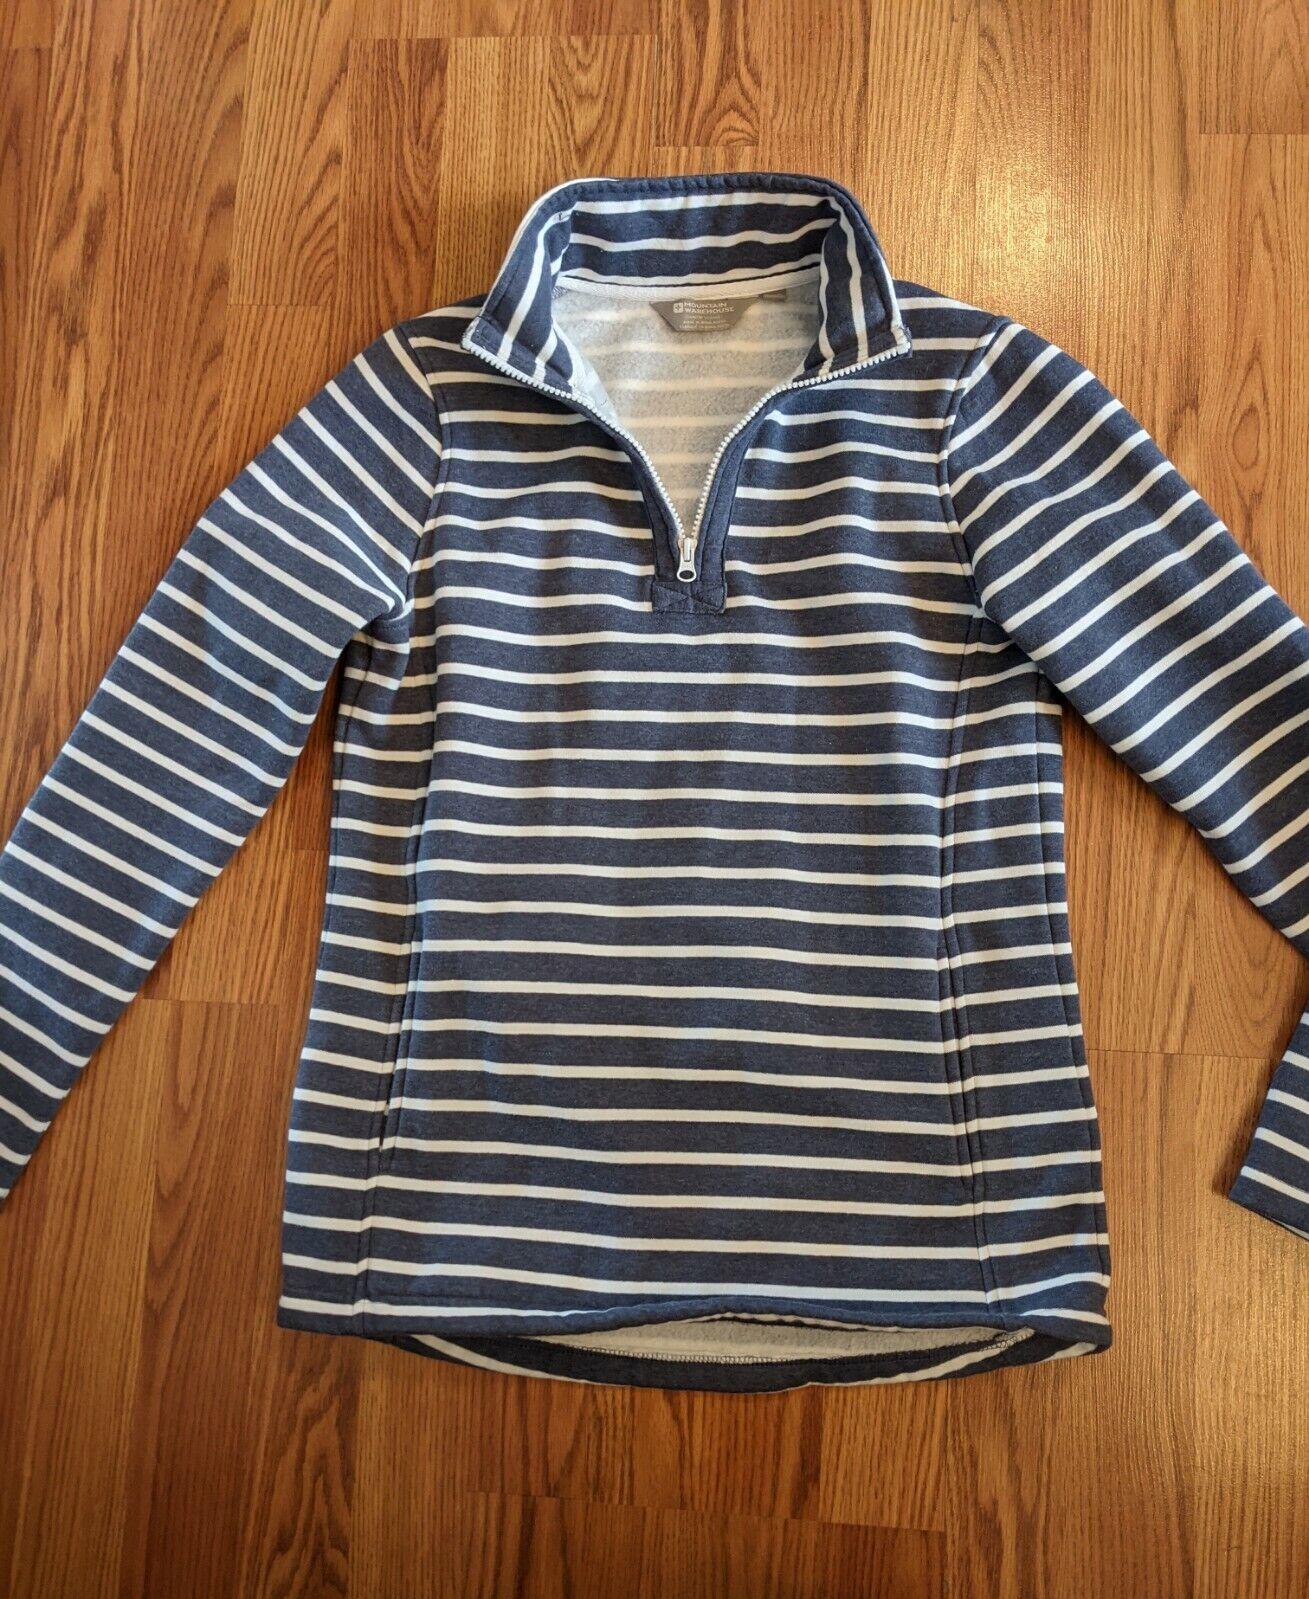 Mountain Warehouse 1/4 Zip Pullover Sweatshirt Womens Size 6 Blue White Stripe